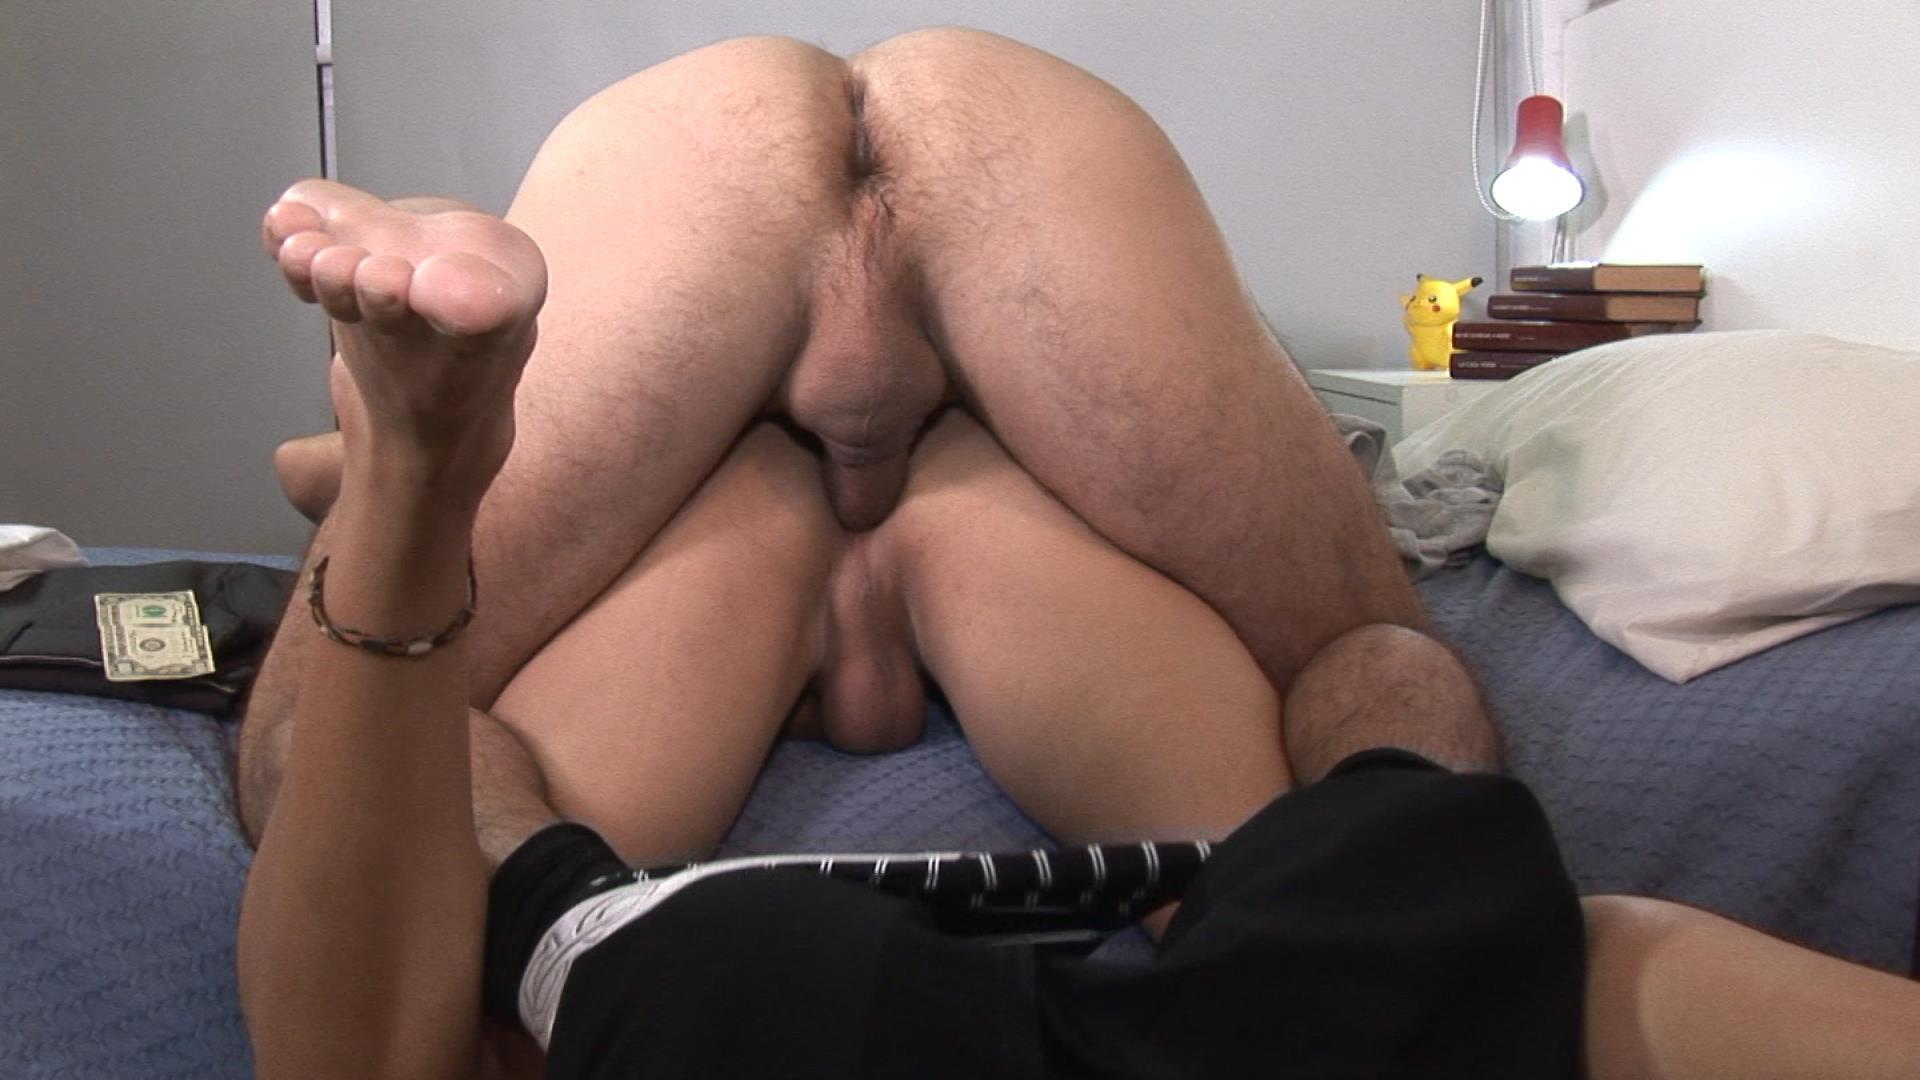 colby jansen fucked bareback on pornhub